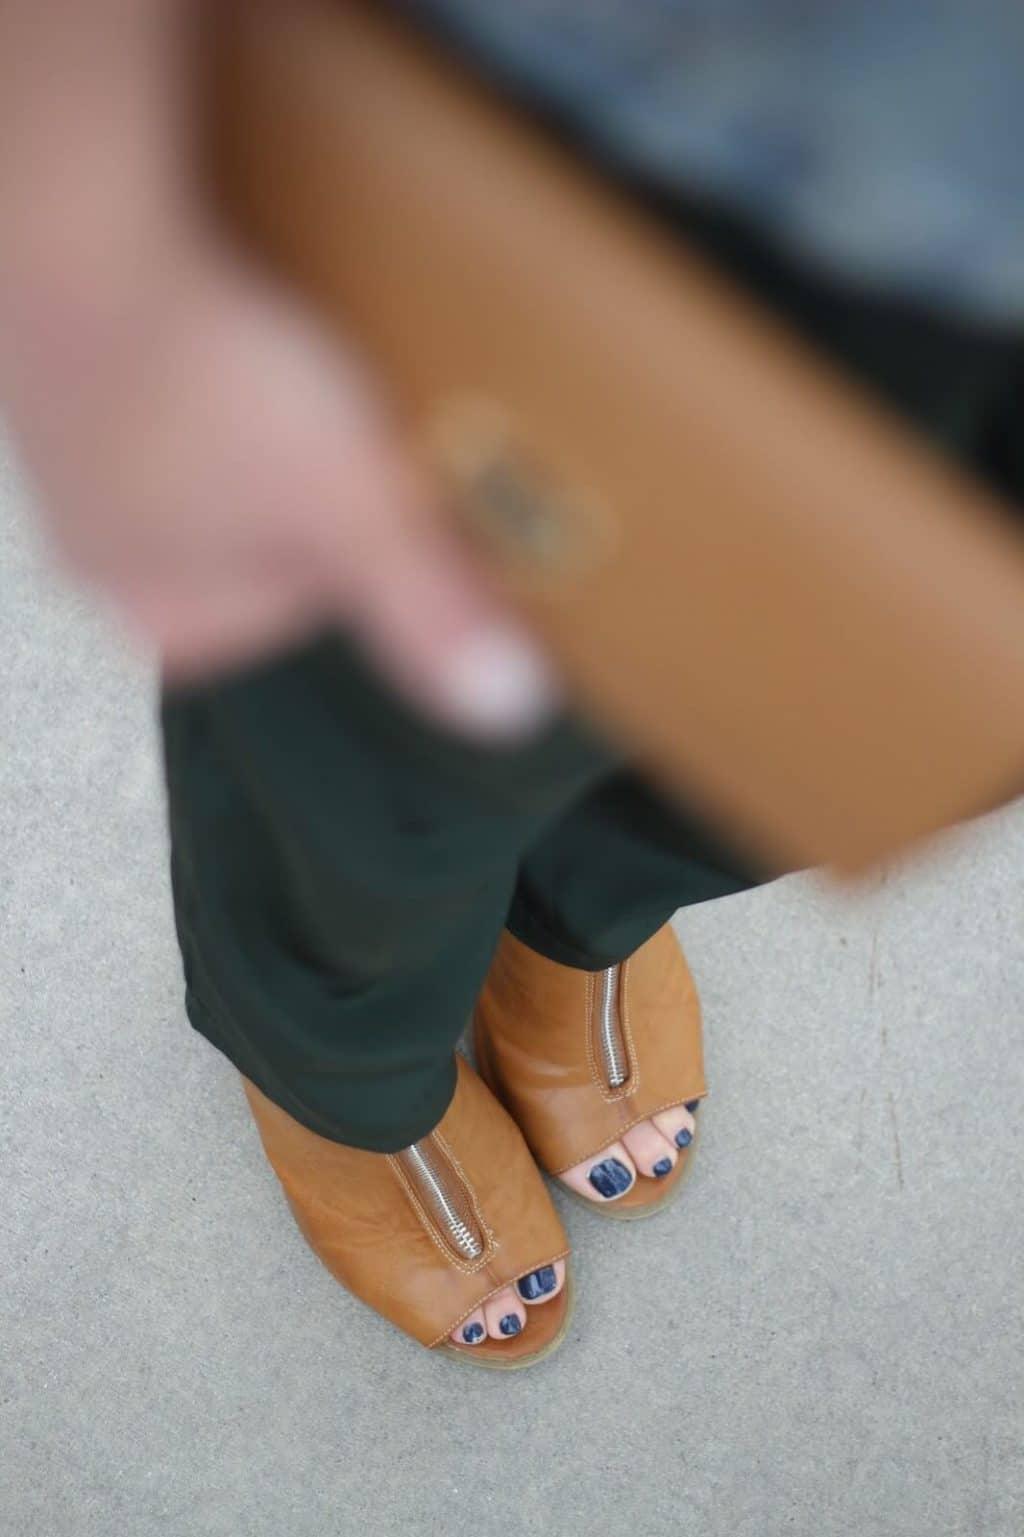 Dressy jogging pants with heels